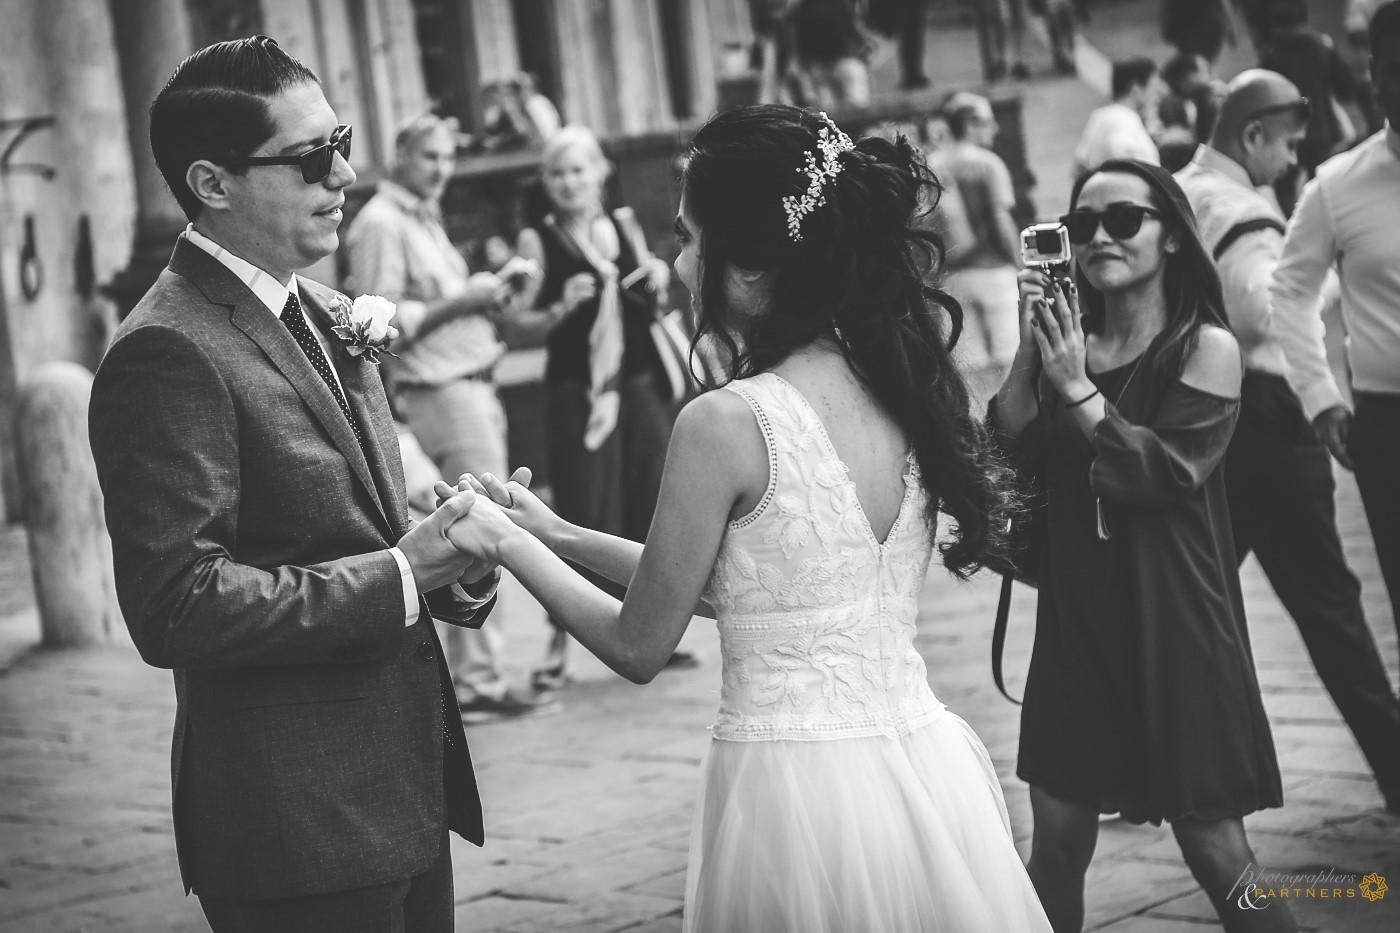 photographers_weddings_siena_05.jpg